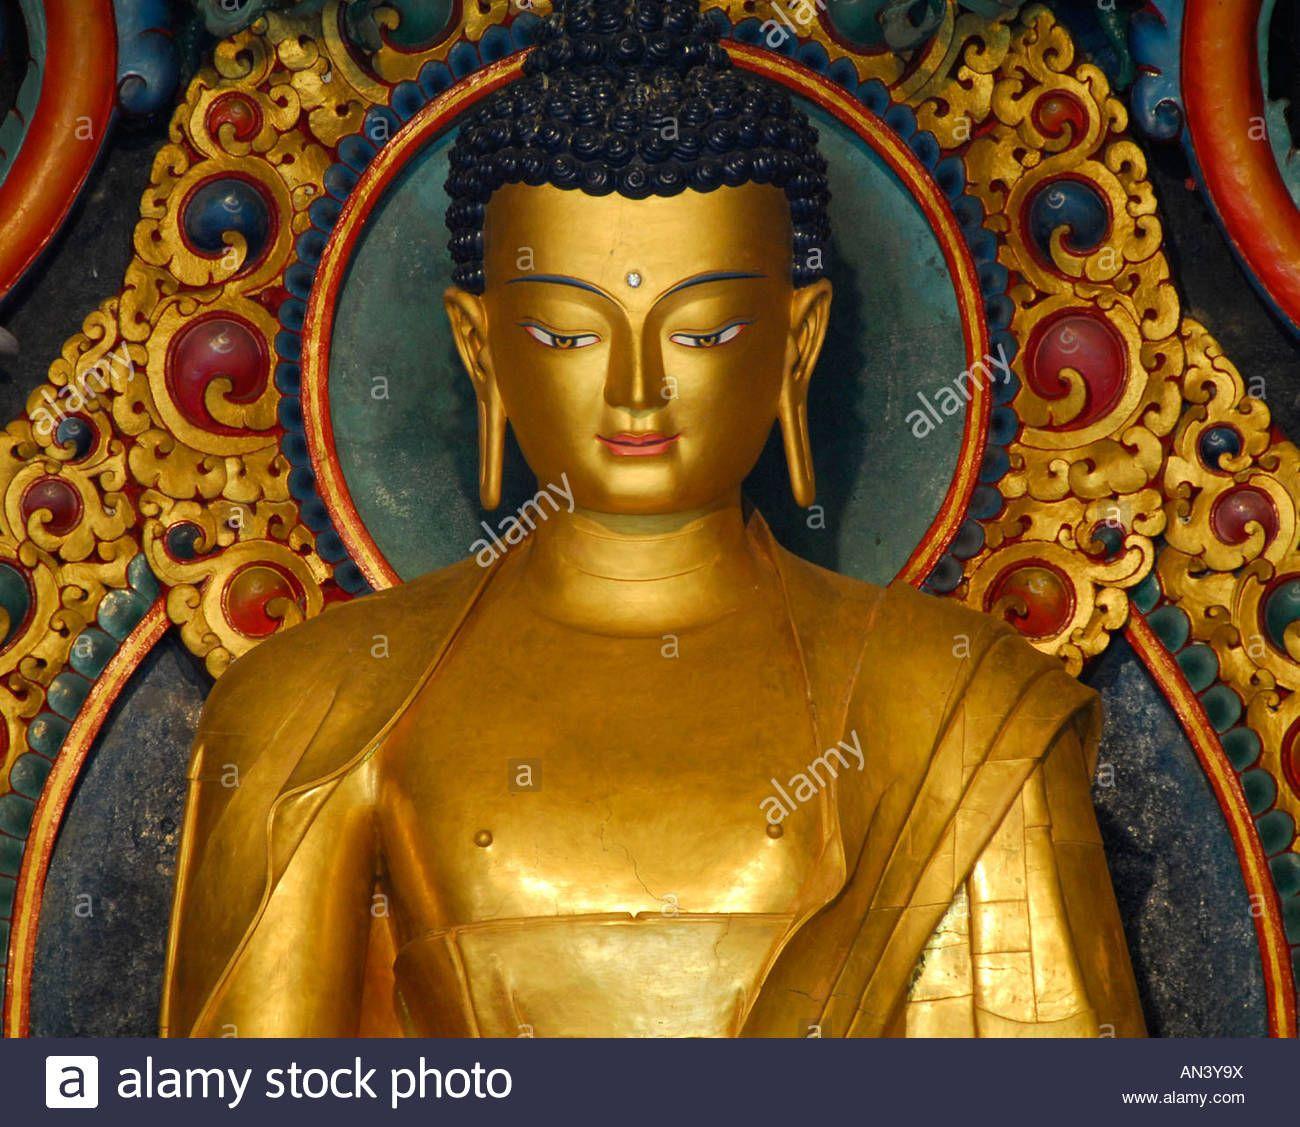 Download This Stock Image Golden Buddha Statue In Bodhgaya